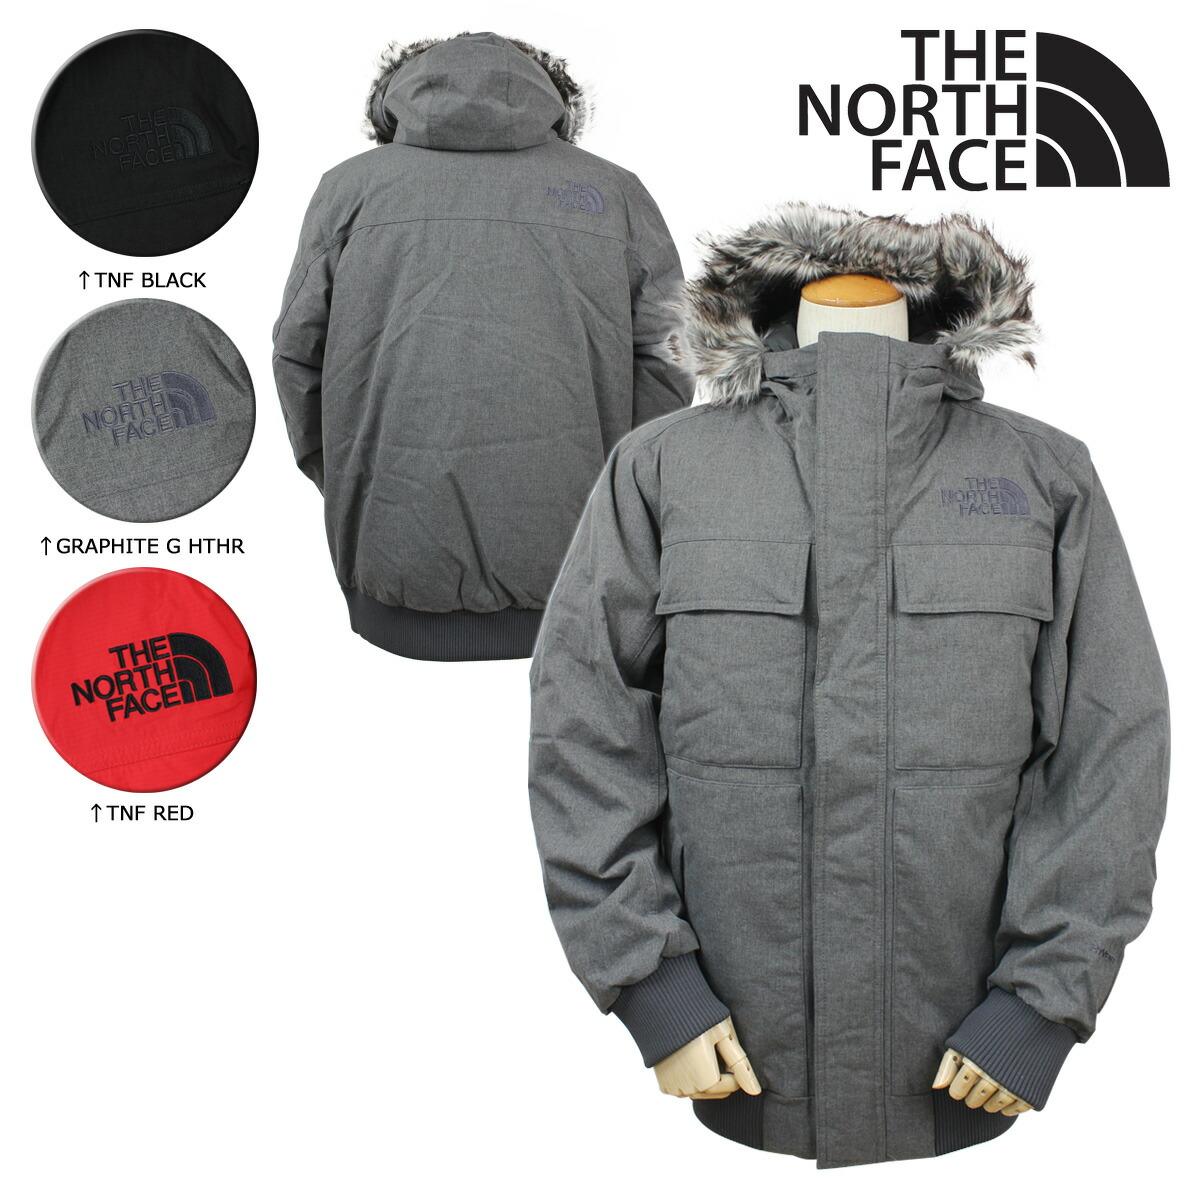 quality design 39765 98ddf North Face THE NORTH FACE jacket mountain parka MEN'S GOTHAM JACKET 2 men